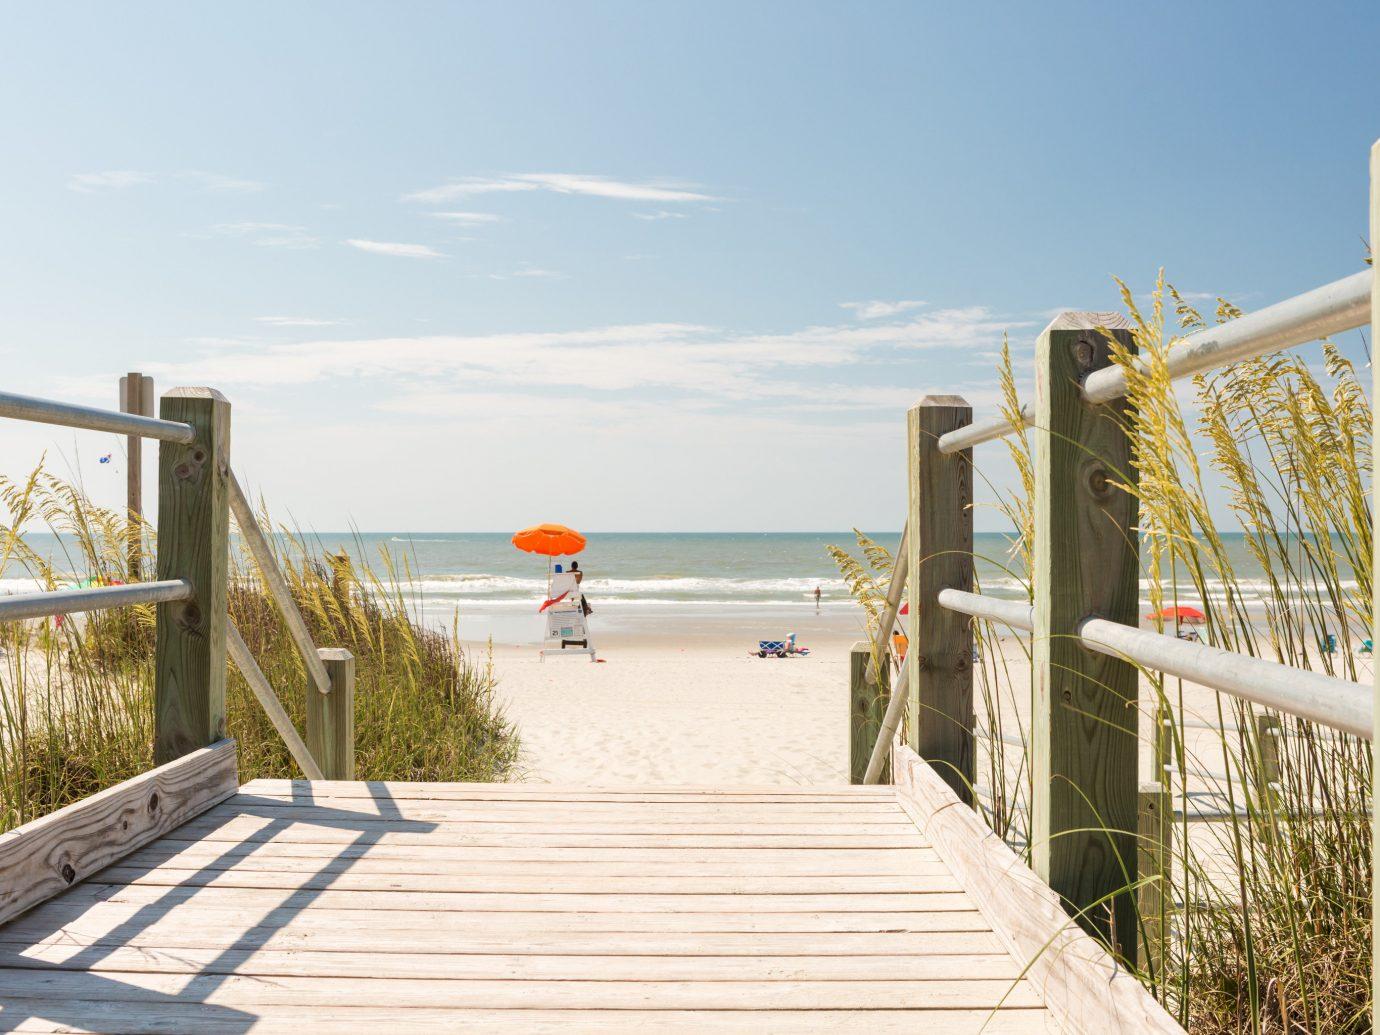 News Trip Ideas sky outdoor walkway building boardwalk vacation Beach estate Sea Deck cottage day